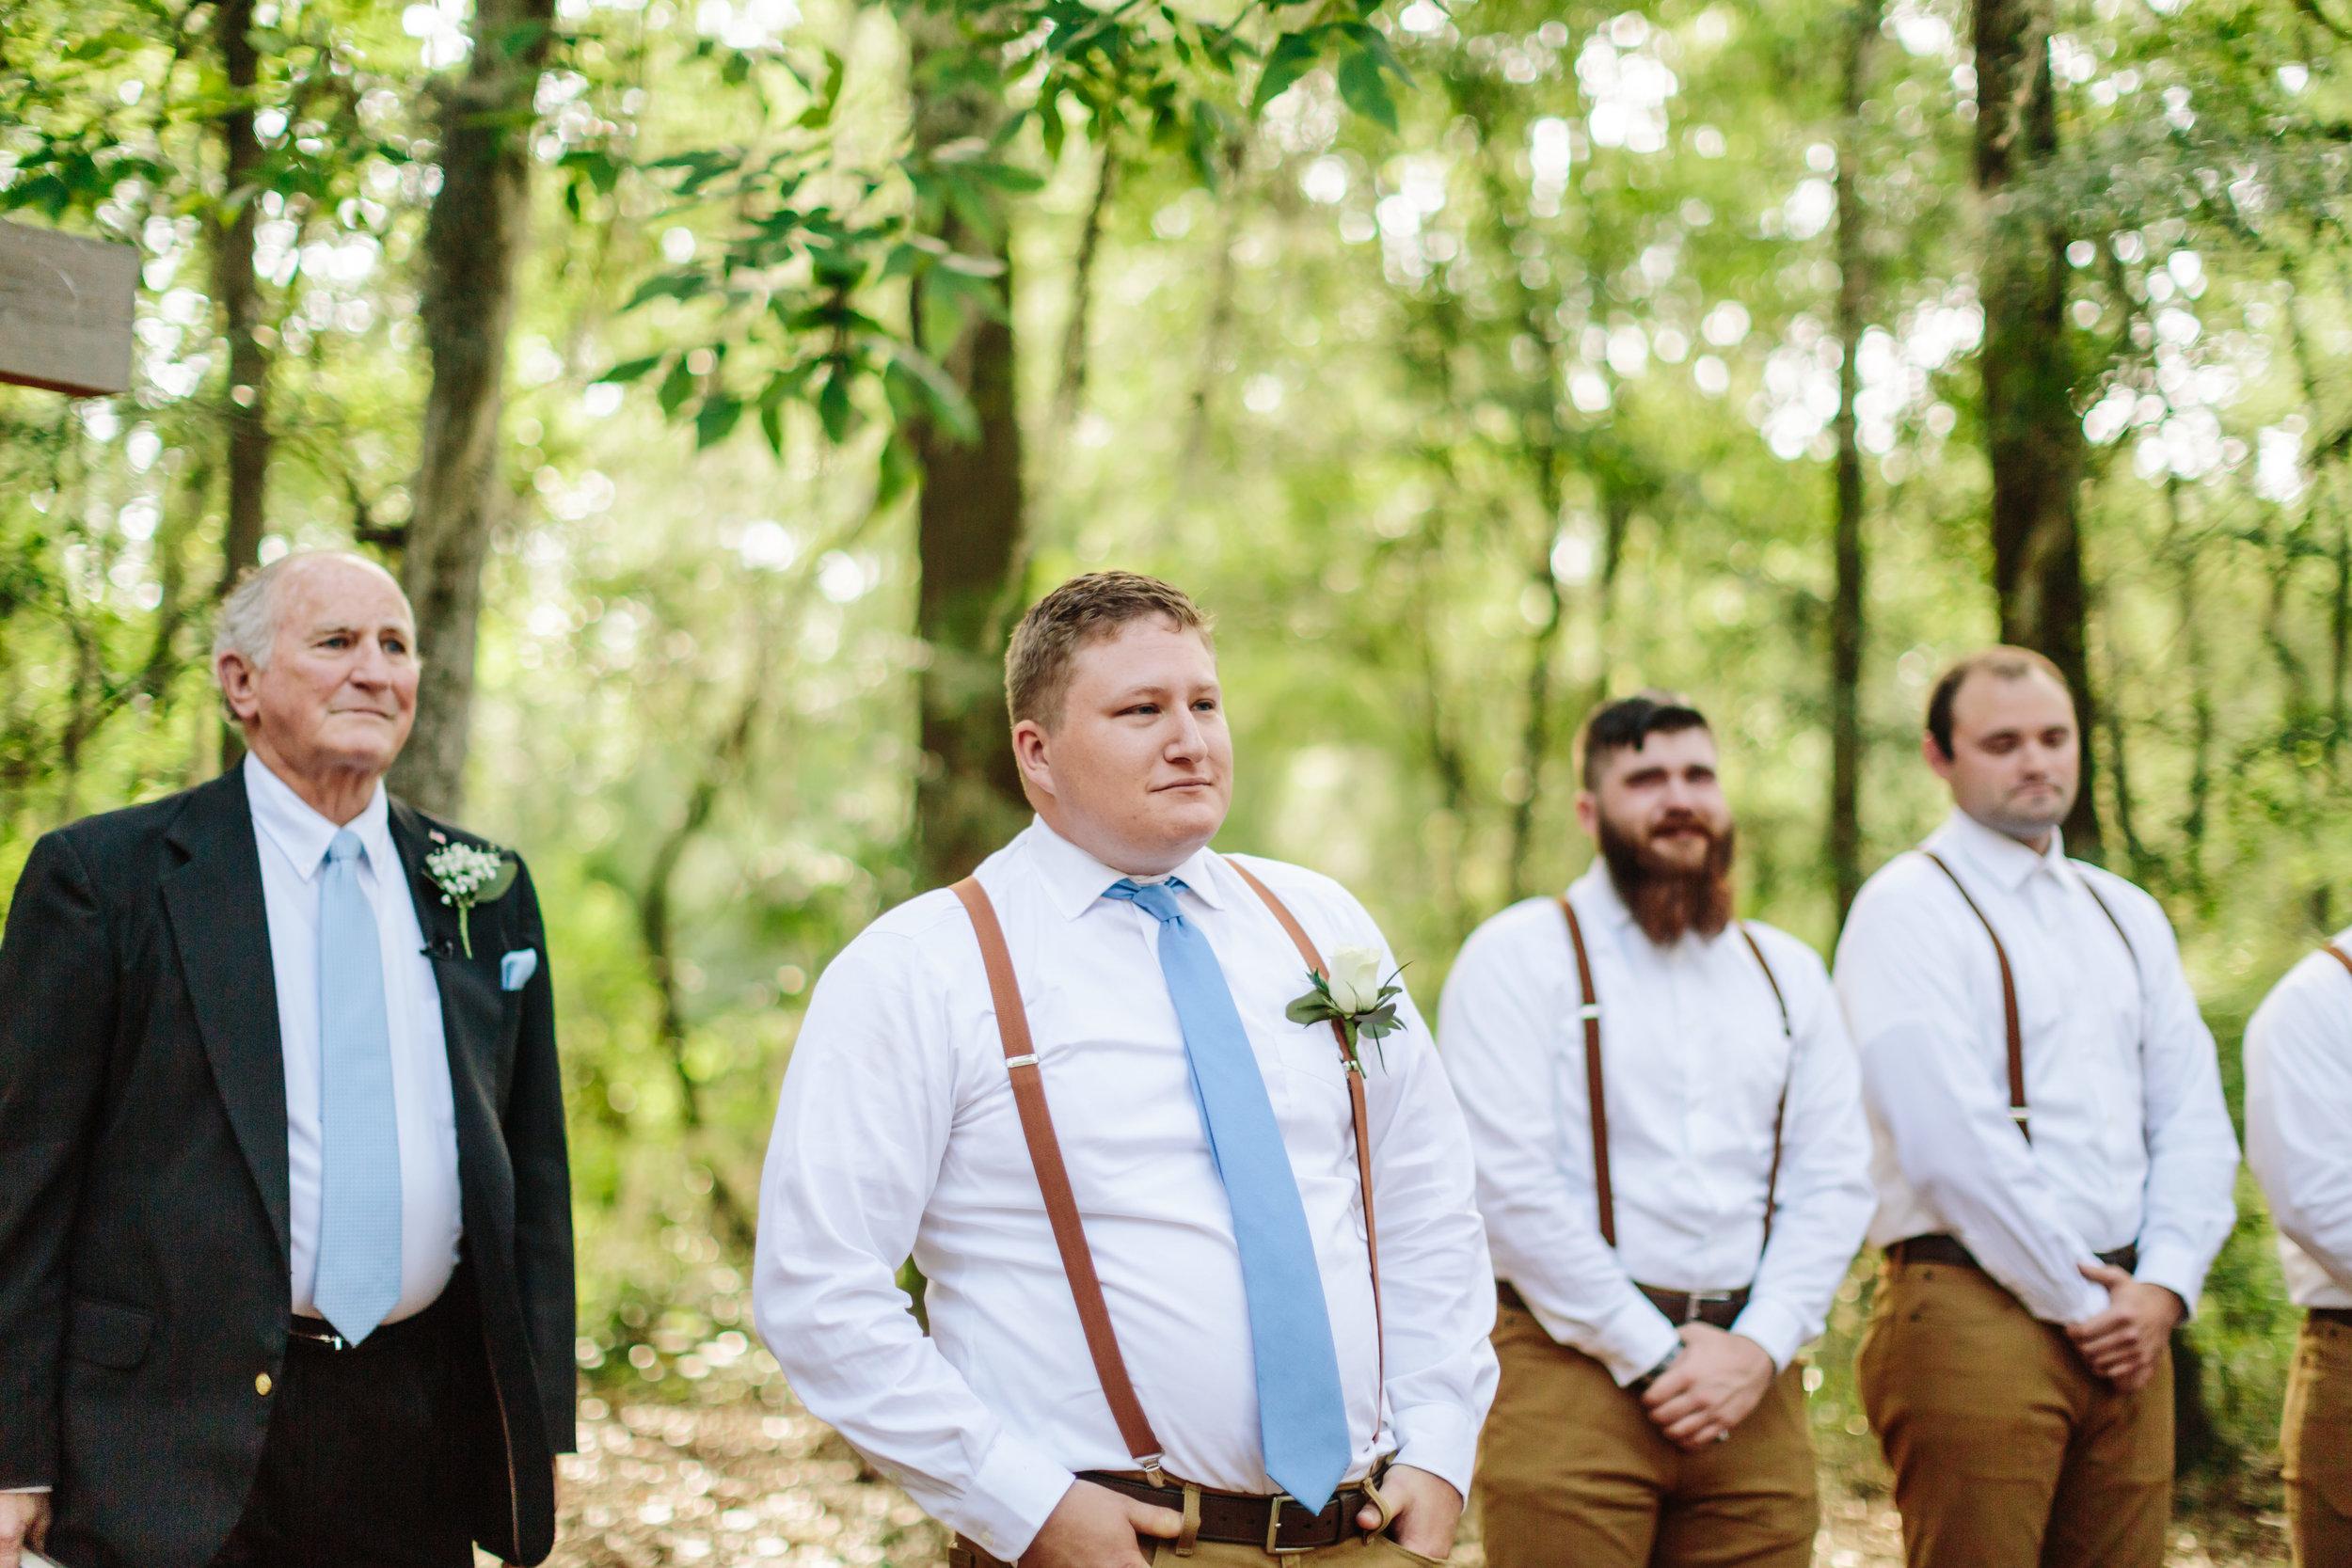 Griffin Wedding October Oaks Farm-304.jpg